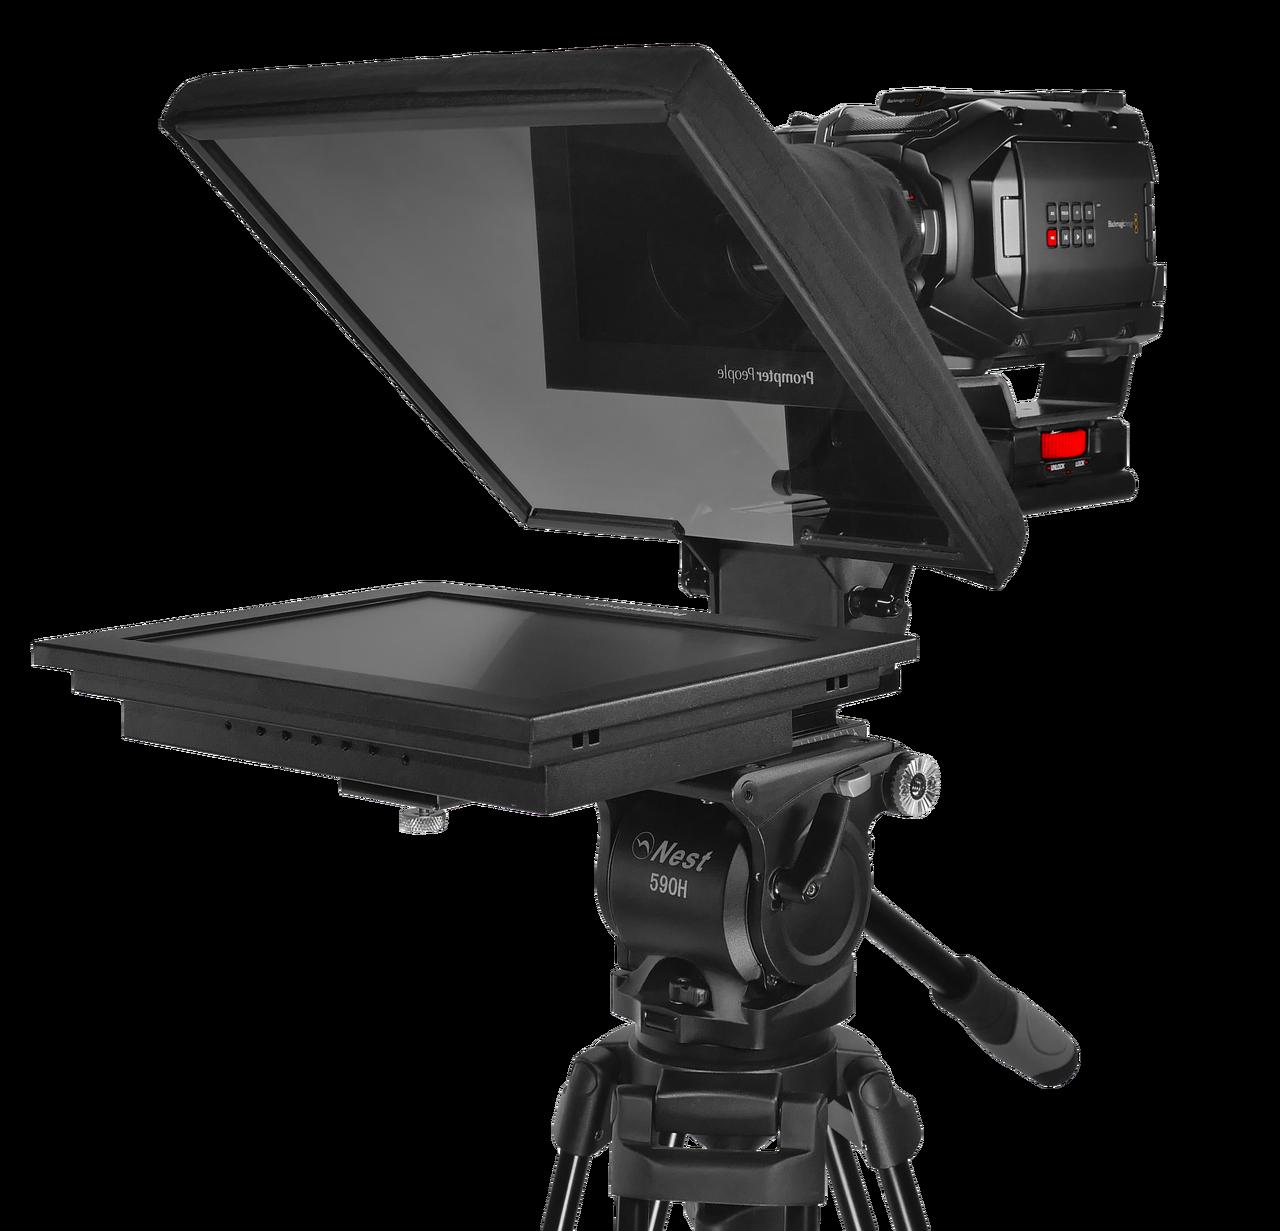 UltraFlex 12 HighBright Auto-Reversing Monitor Model - Angled